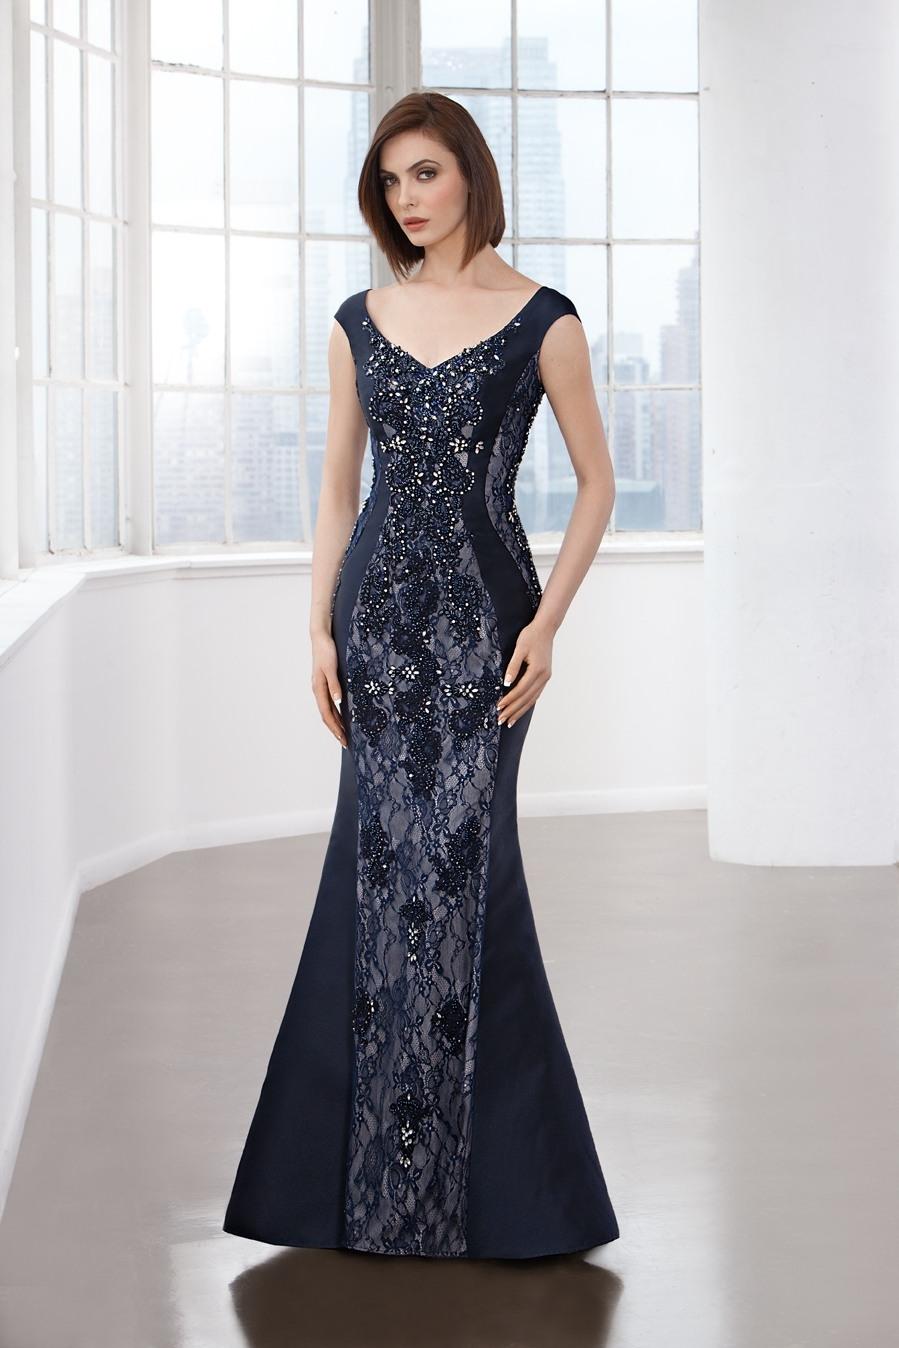 Designer Elegant Abendkleider Frankfurt DesignFormal Luxus Abendkleider Frankfurt Boutique